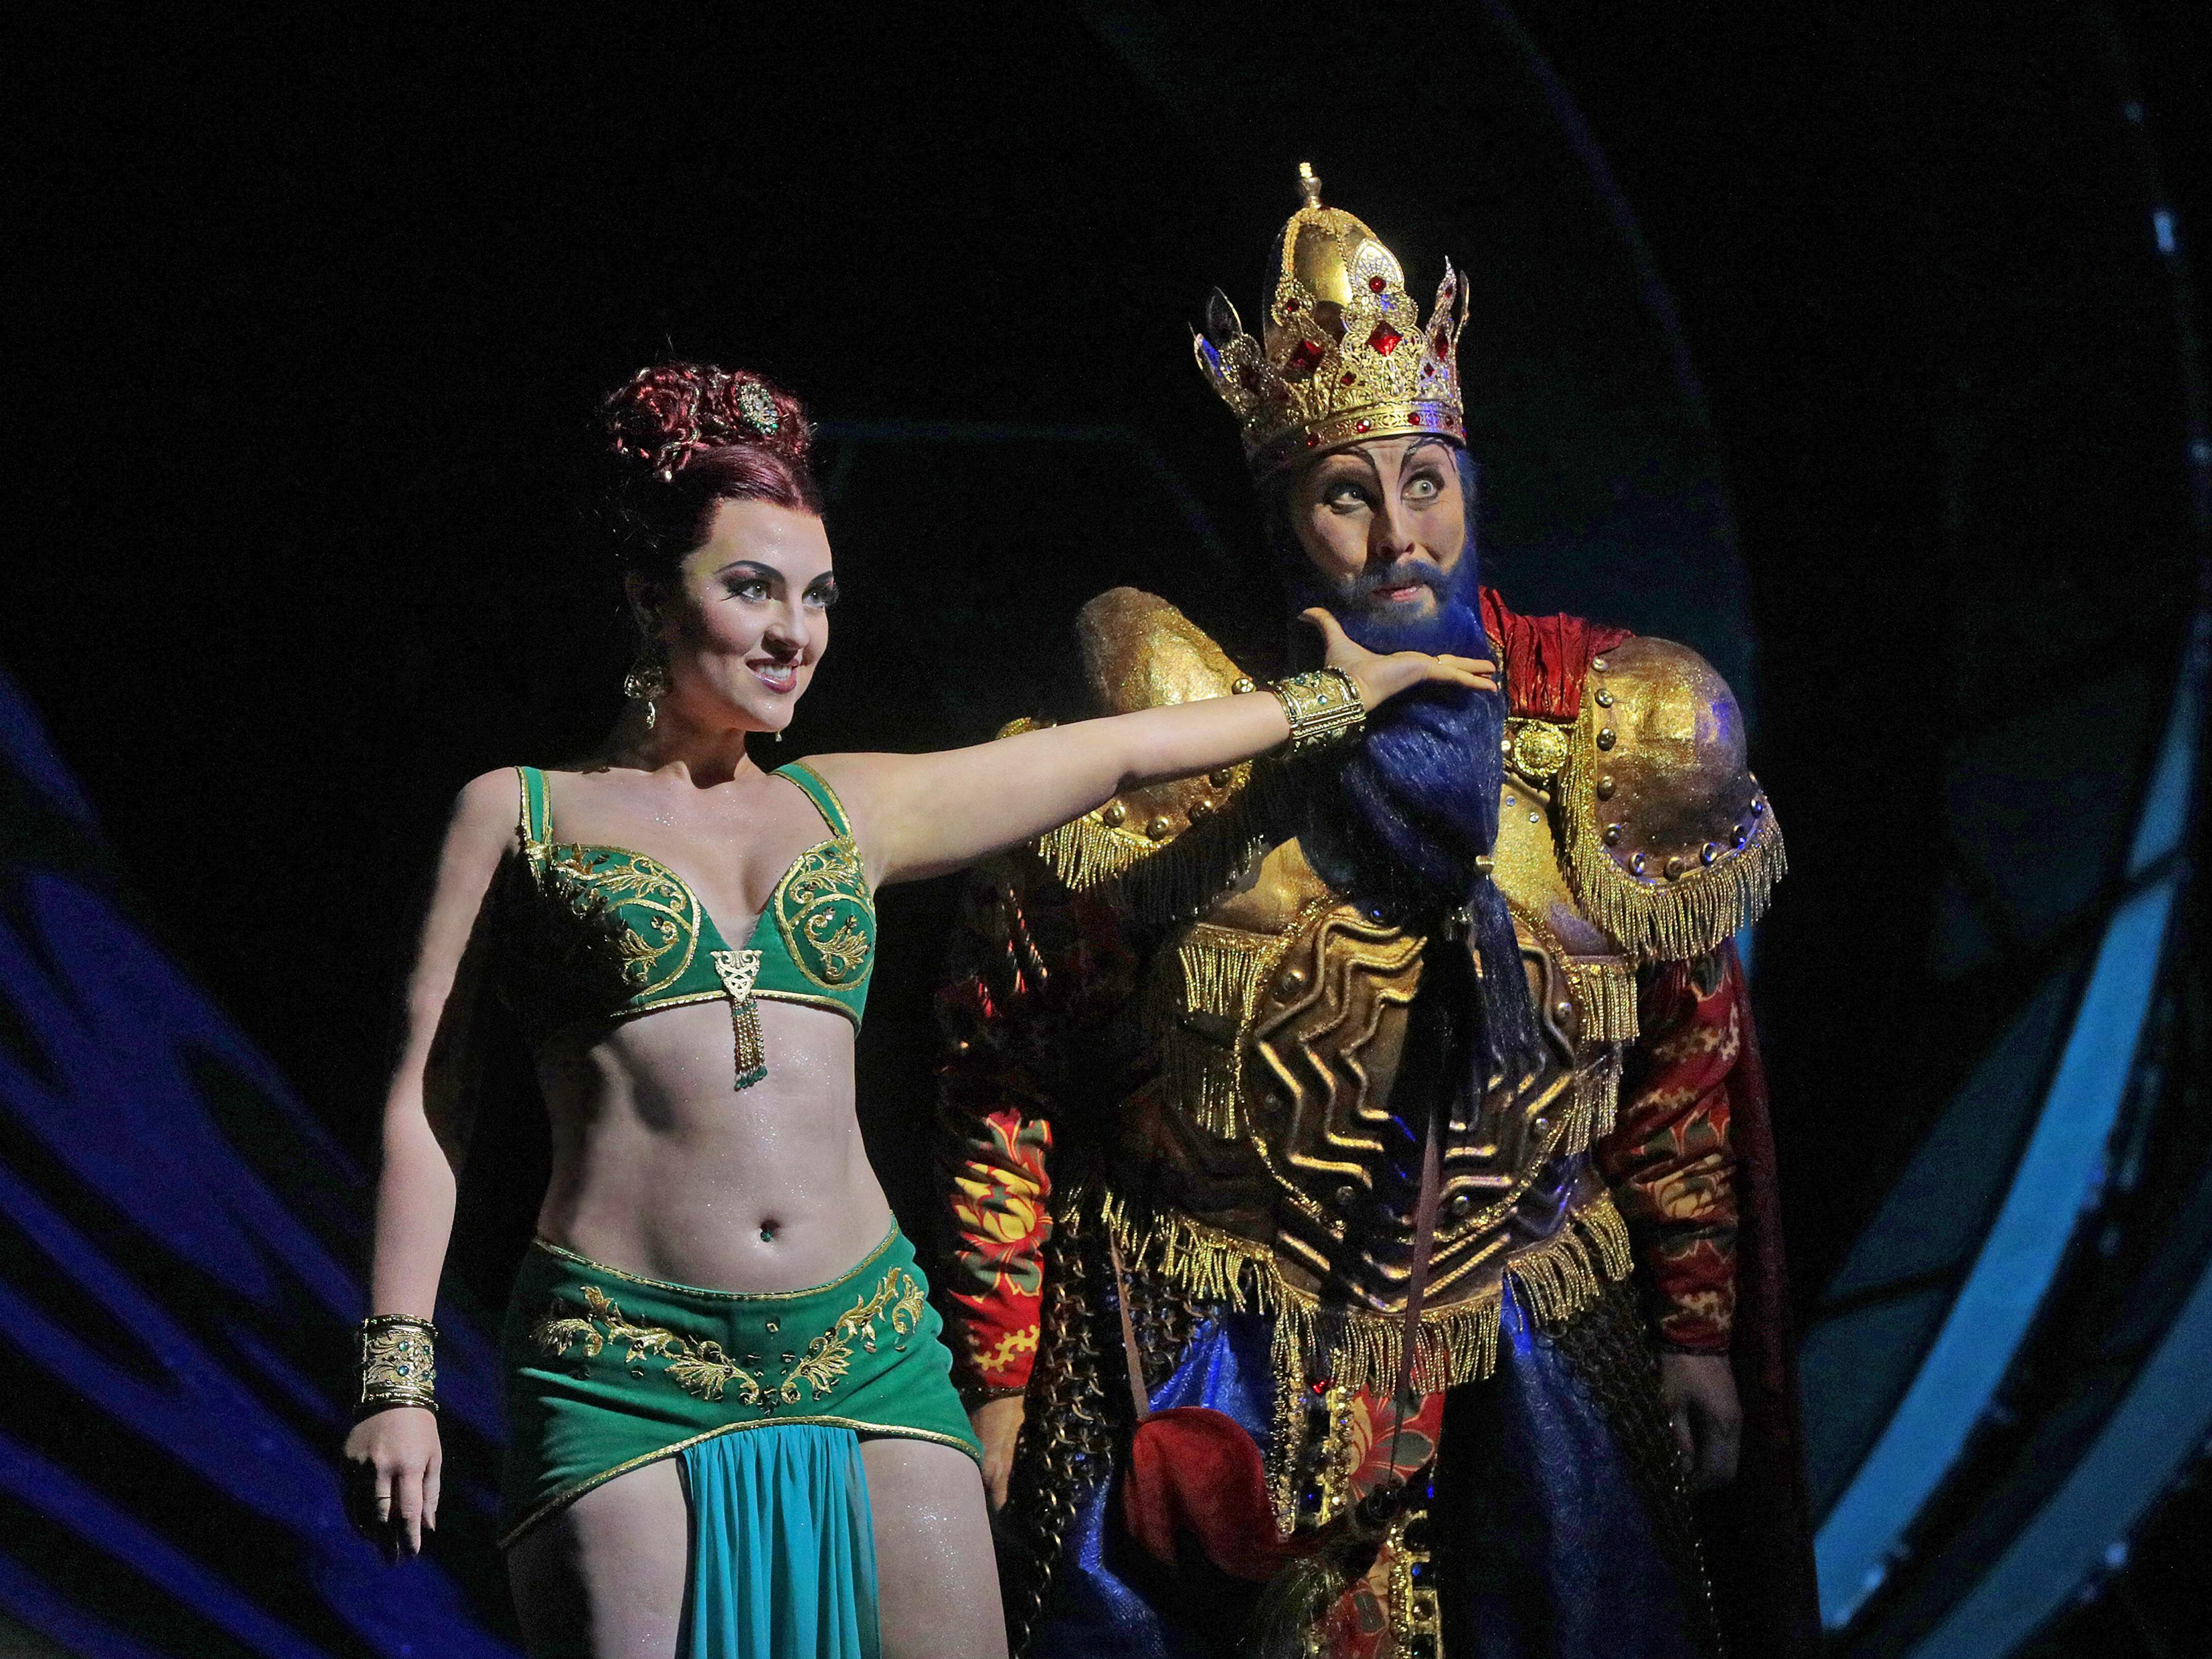 BWW Review: THE GOLDEN COCKEREL at Santa Fe Opera